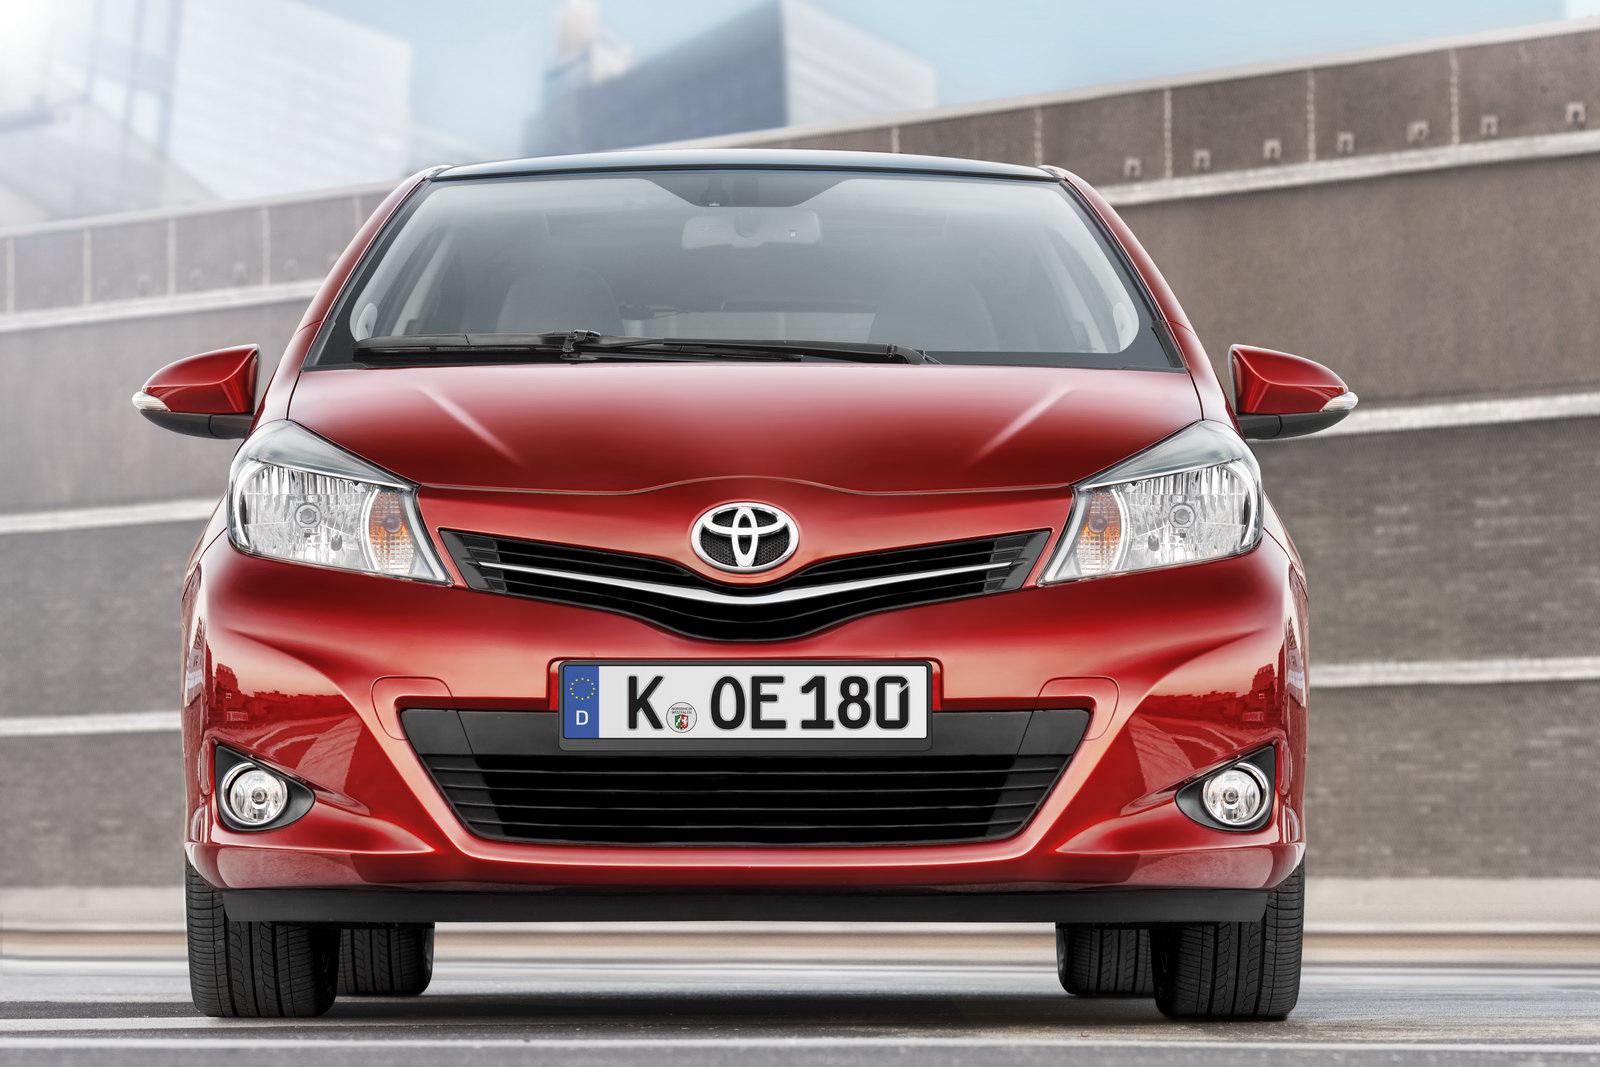 Photo of Η Toyota είναι η πρώτη αυτοκινητοβιομηχανία στην Ευρώπη  με τις χαμηλότερες μέσες εκπομπές CO2